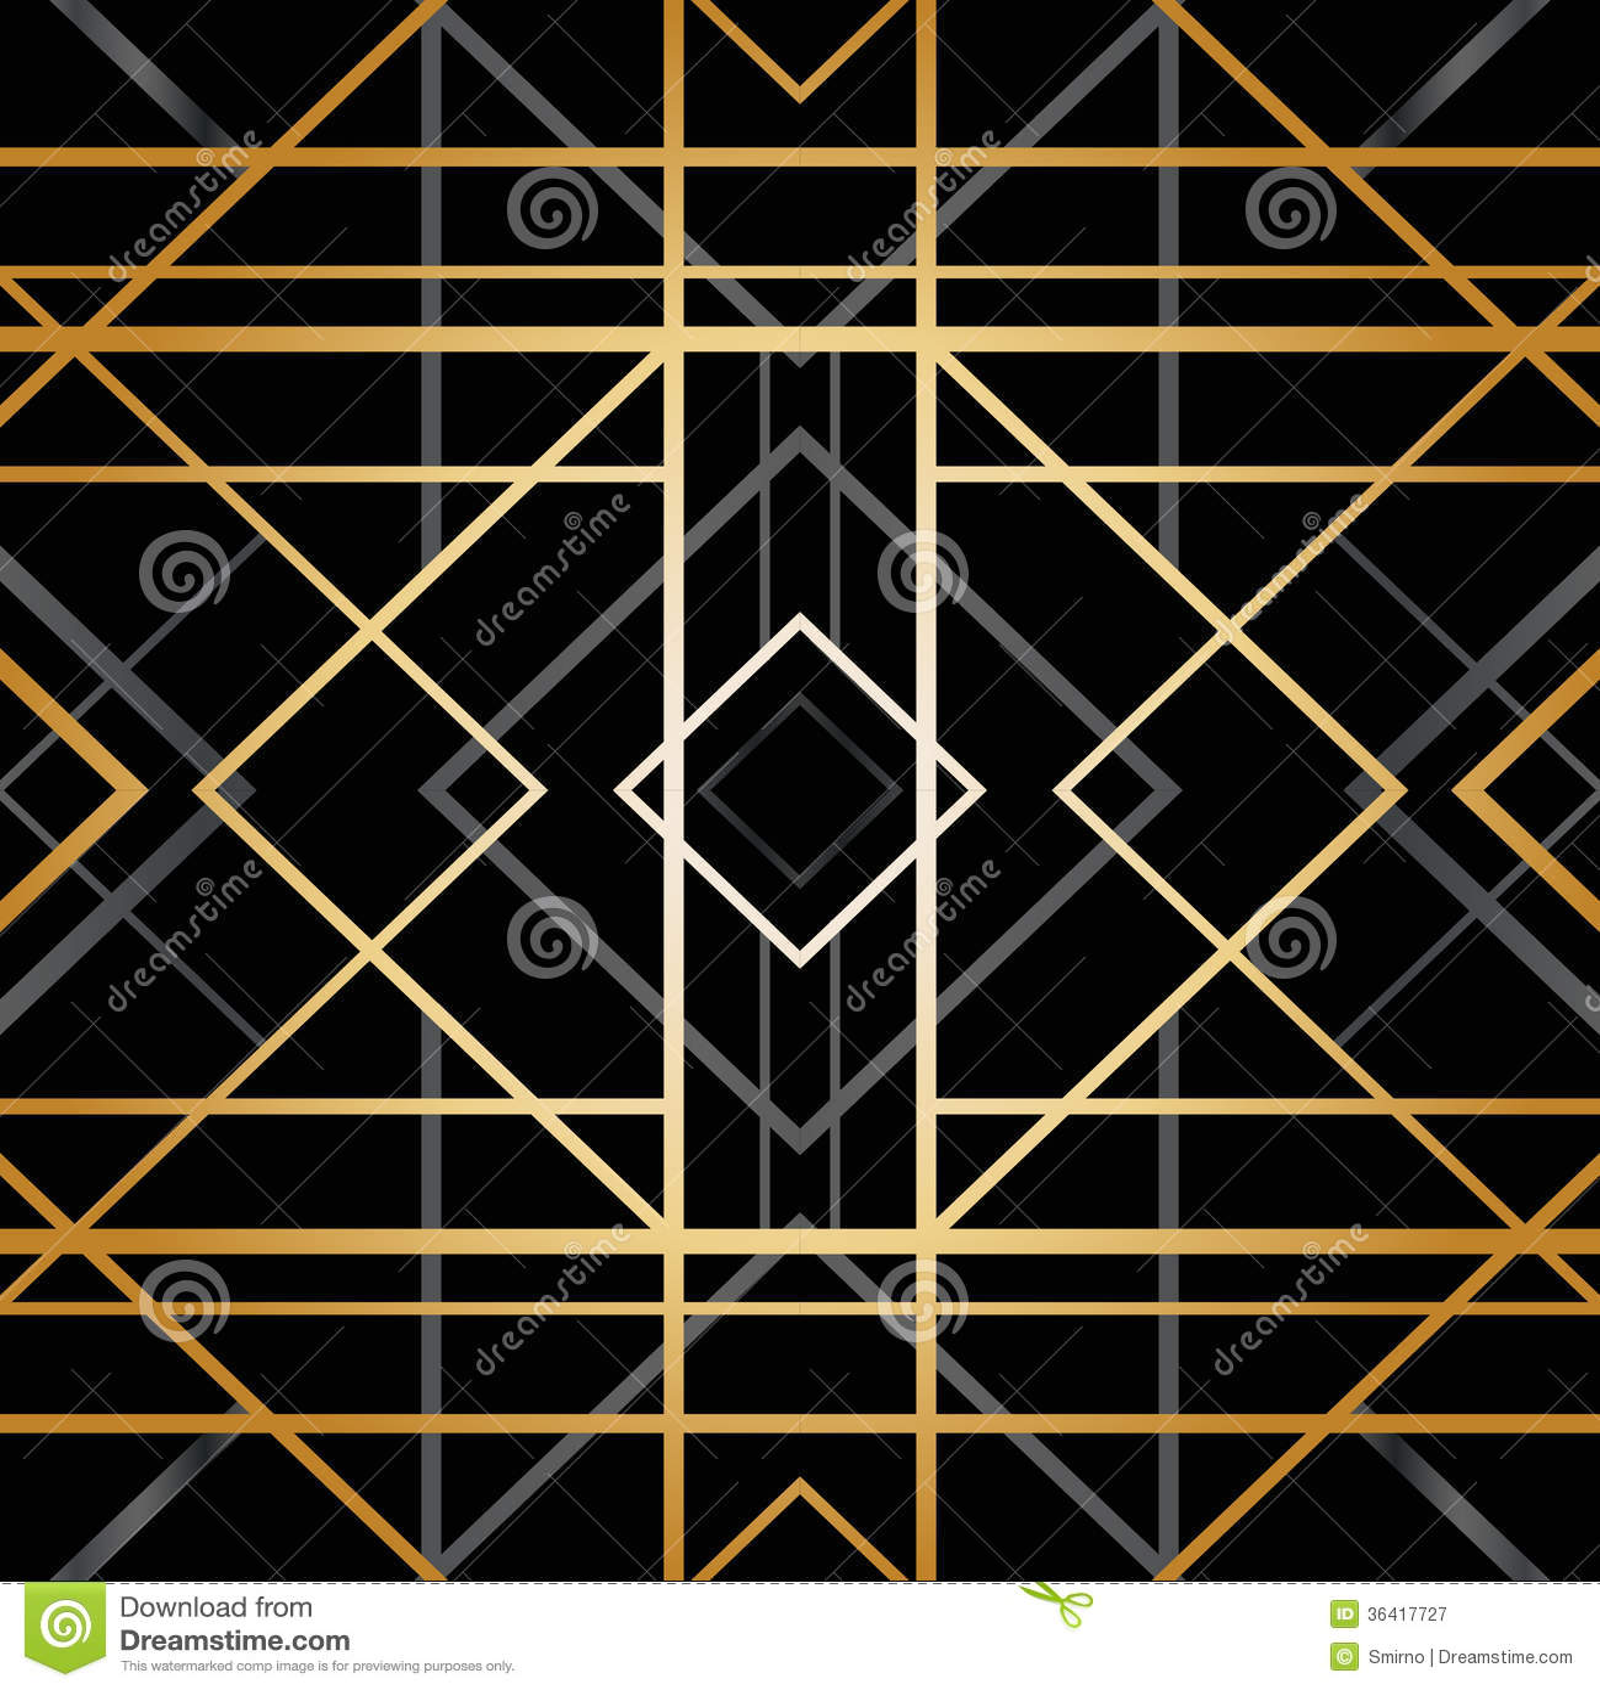 Art deco geometric pattern stock vector. Illustration of backdrop ...